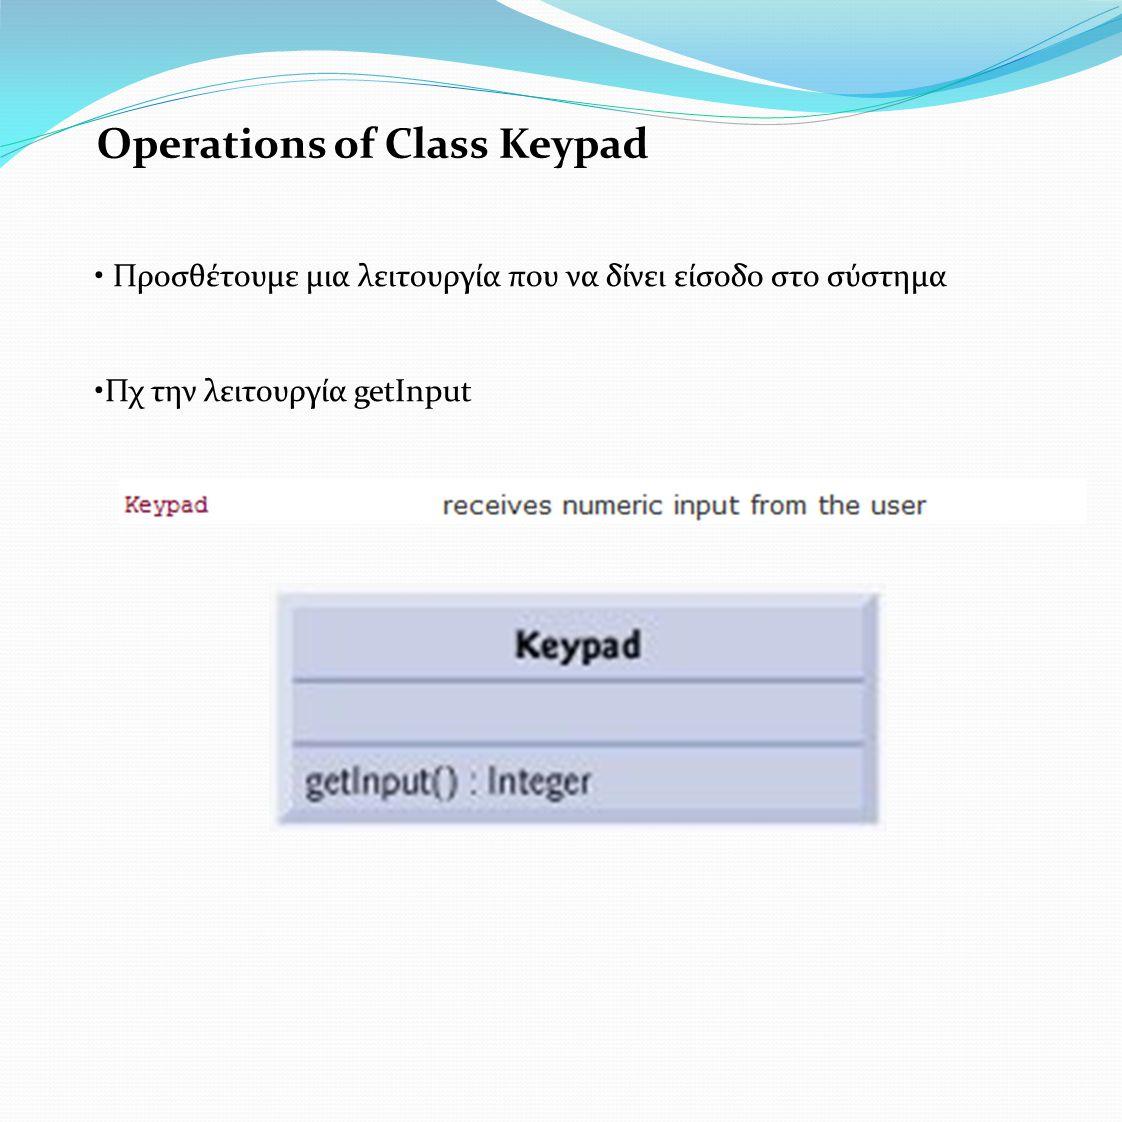 Operations of Class Keypad • Προσθέτουμε μια λειτουργία που να δίνει είσοδο στο σύστημα •Πχ την λειτουργία getInput